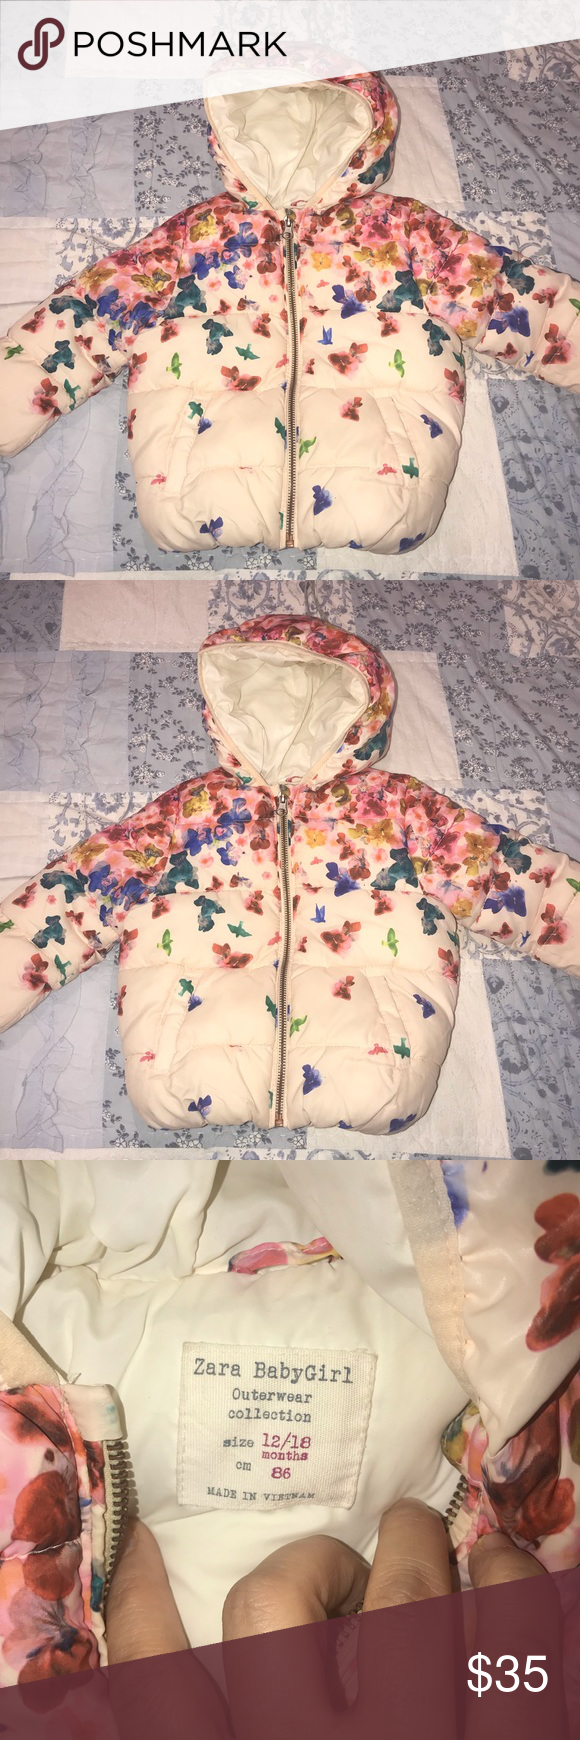 9900d7ba8dd2 Zara baby girl puffer Coat size 12-18 months in 2018